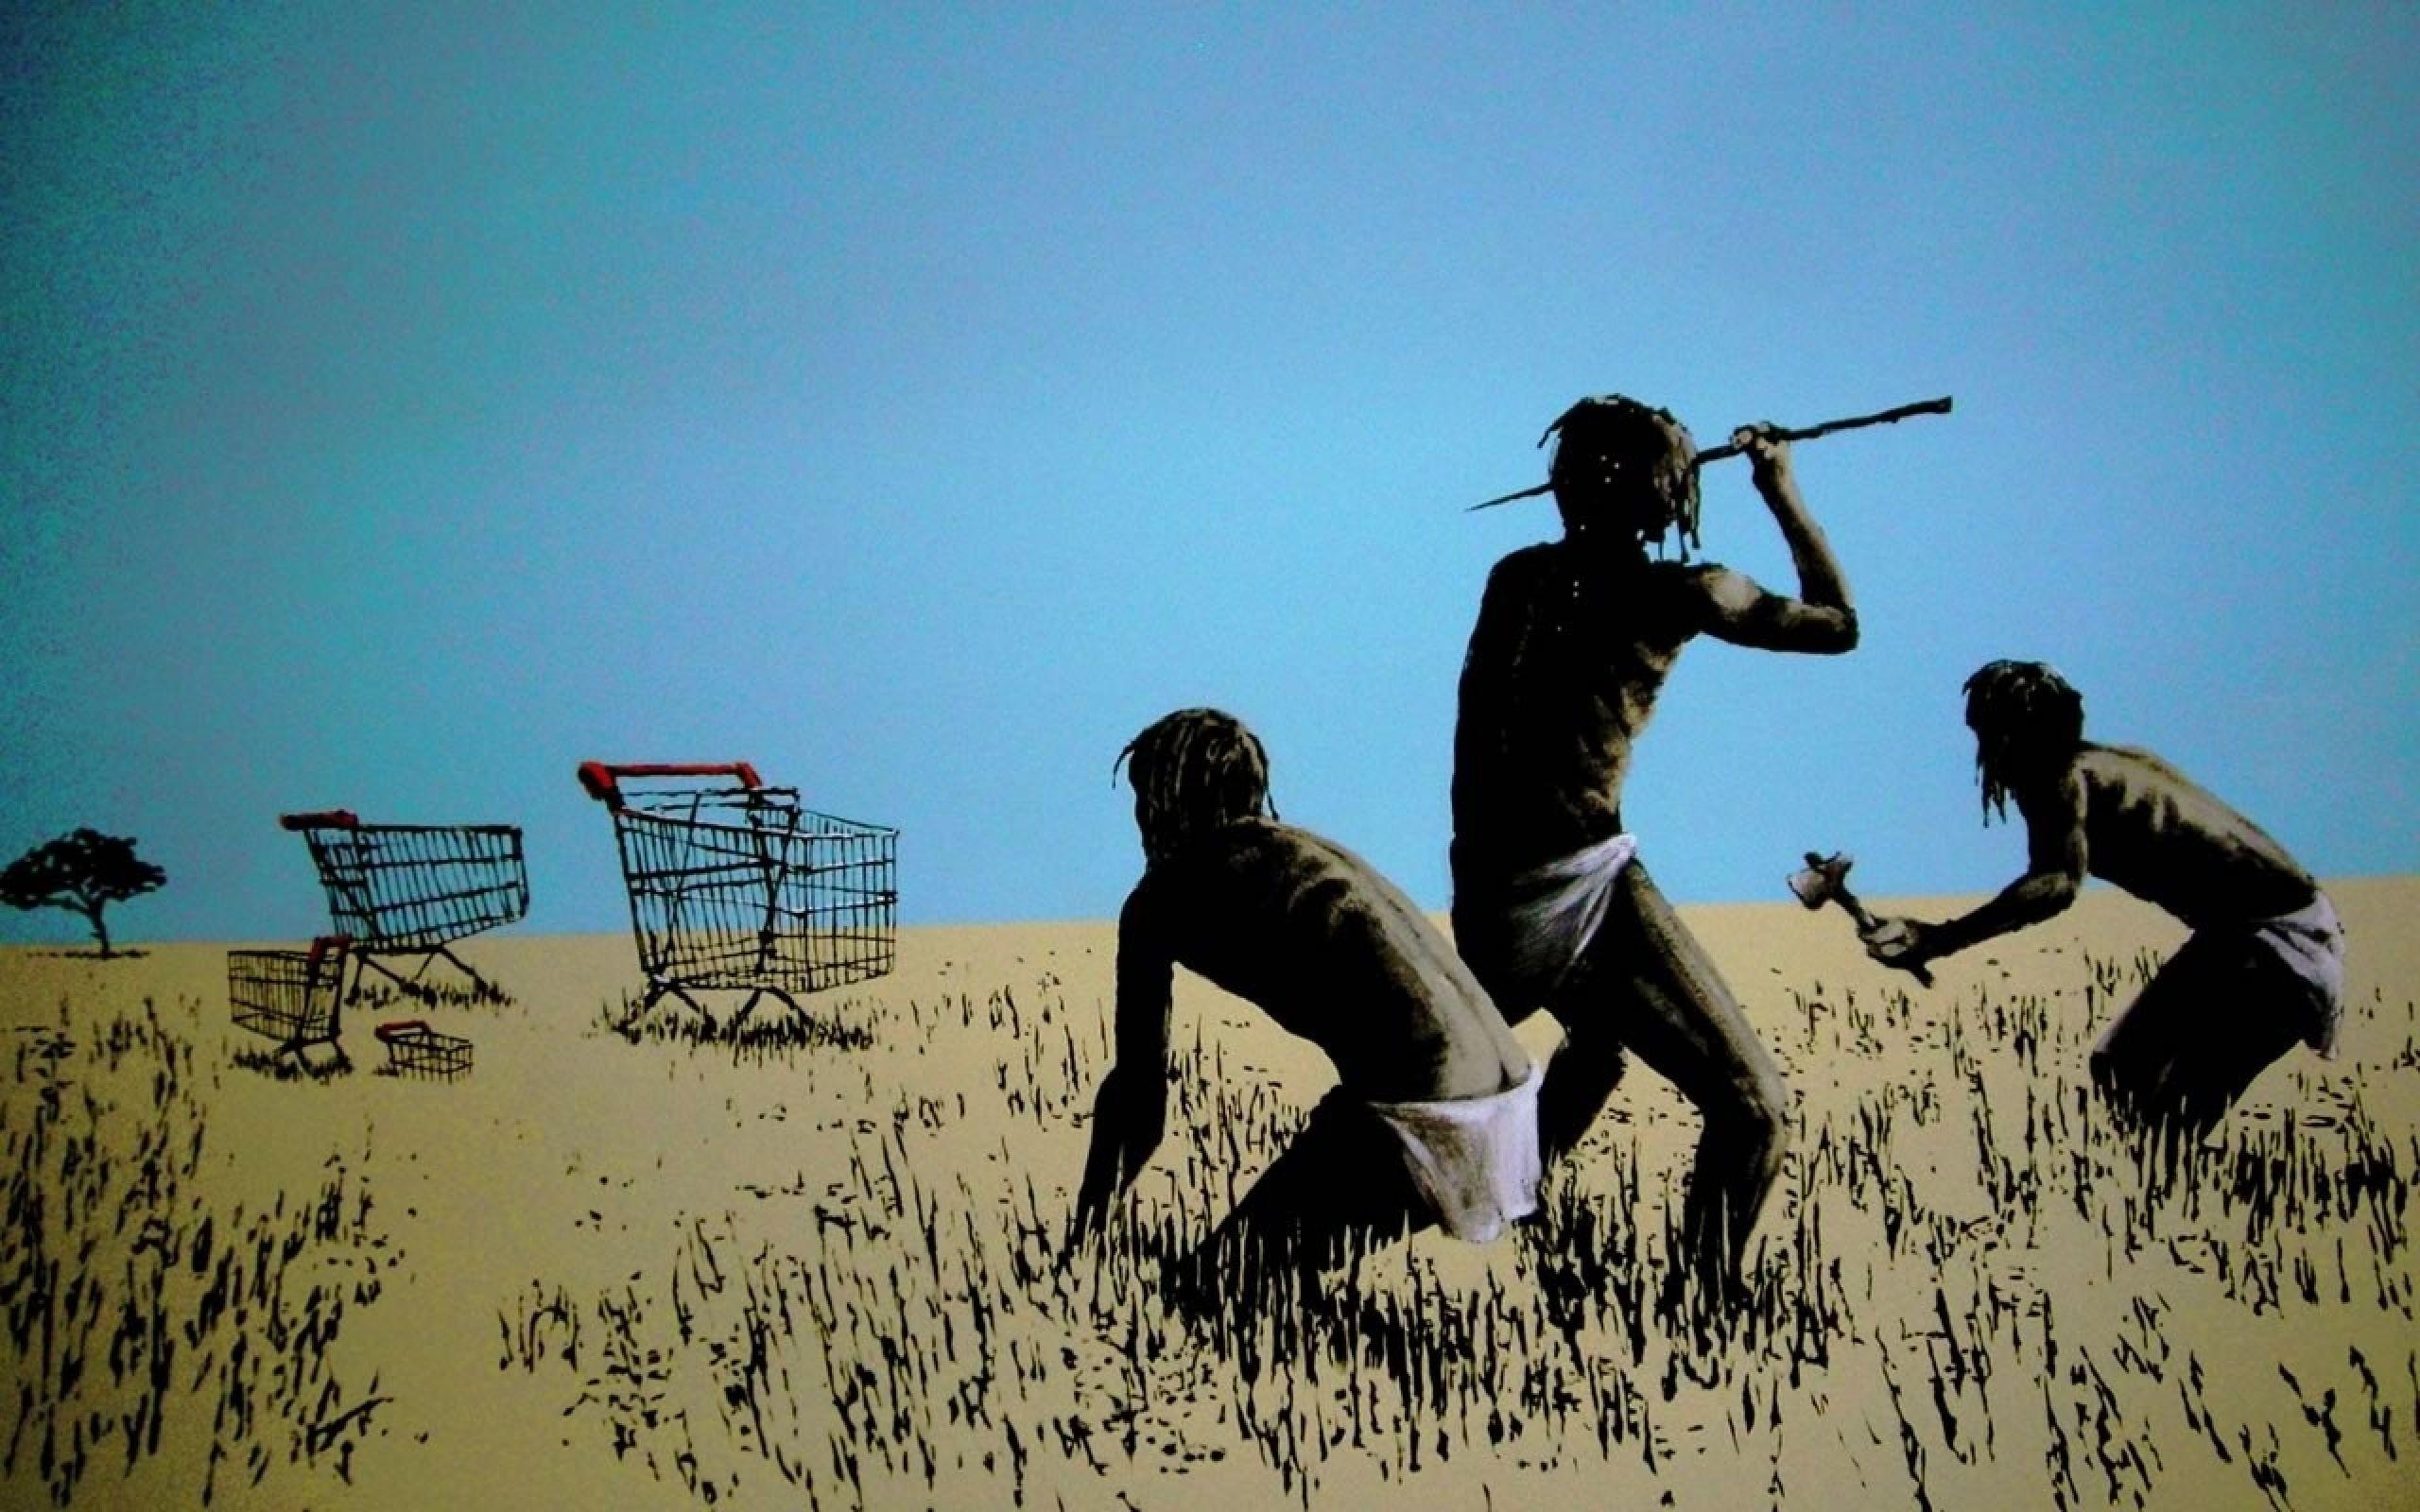 Graffiti, ancient people and Shopping carts, Banksy wallpapers and .